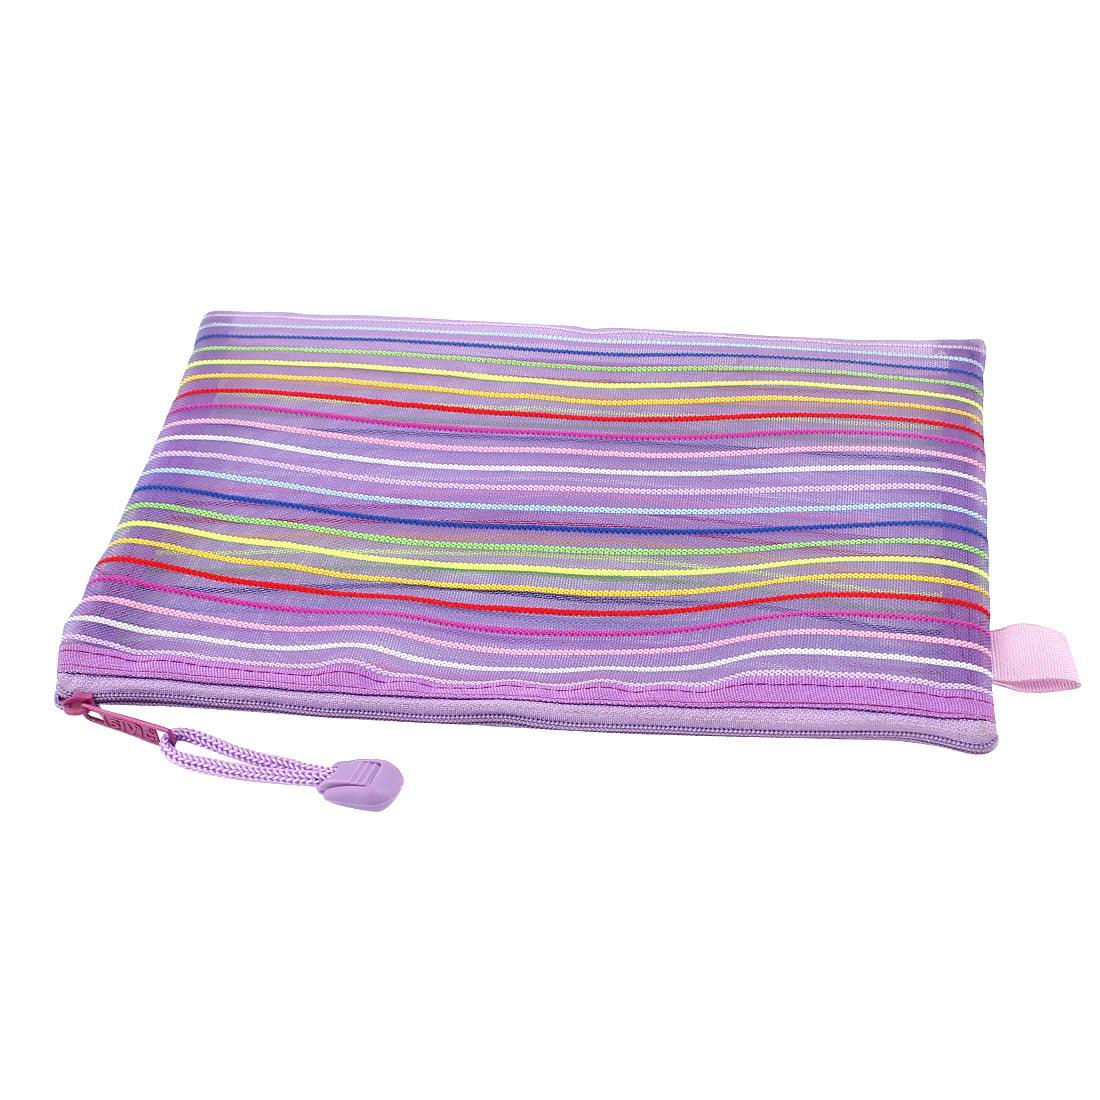 Unique Bargains Meshy Style Stripes Pattern Zip Up A5 Paper Document File Bag Purple - image 2 of 3